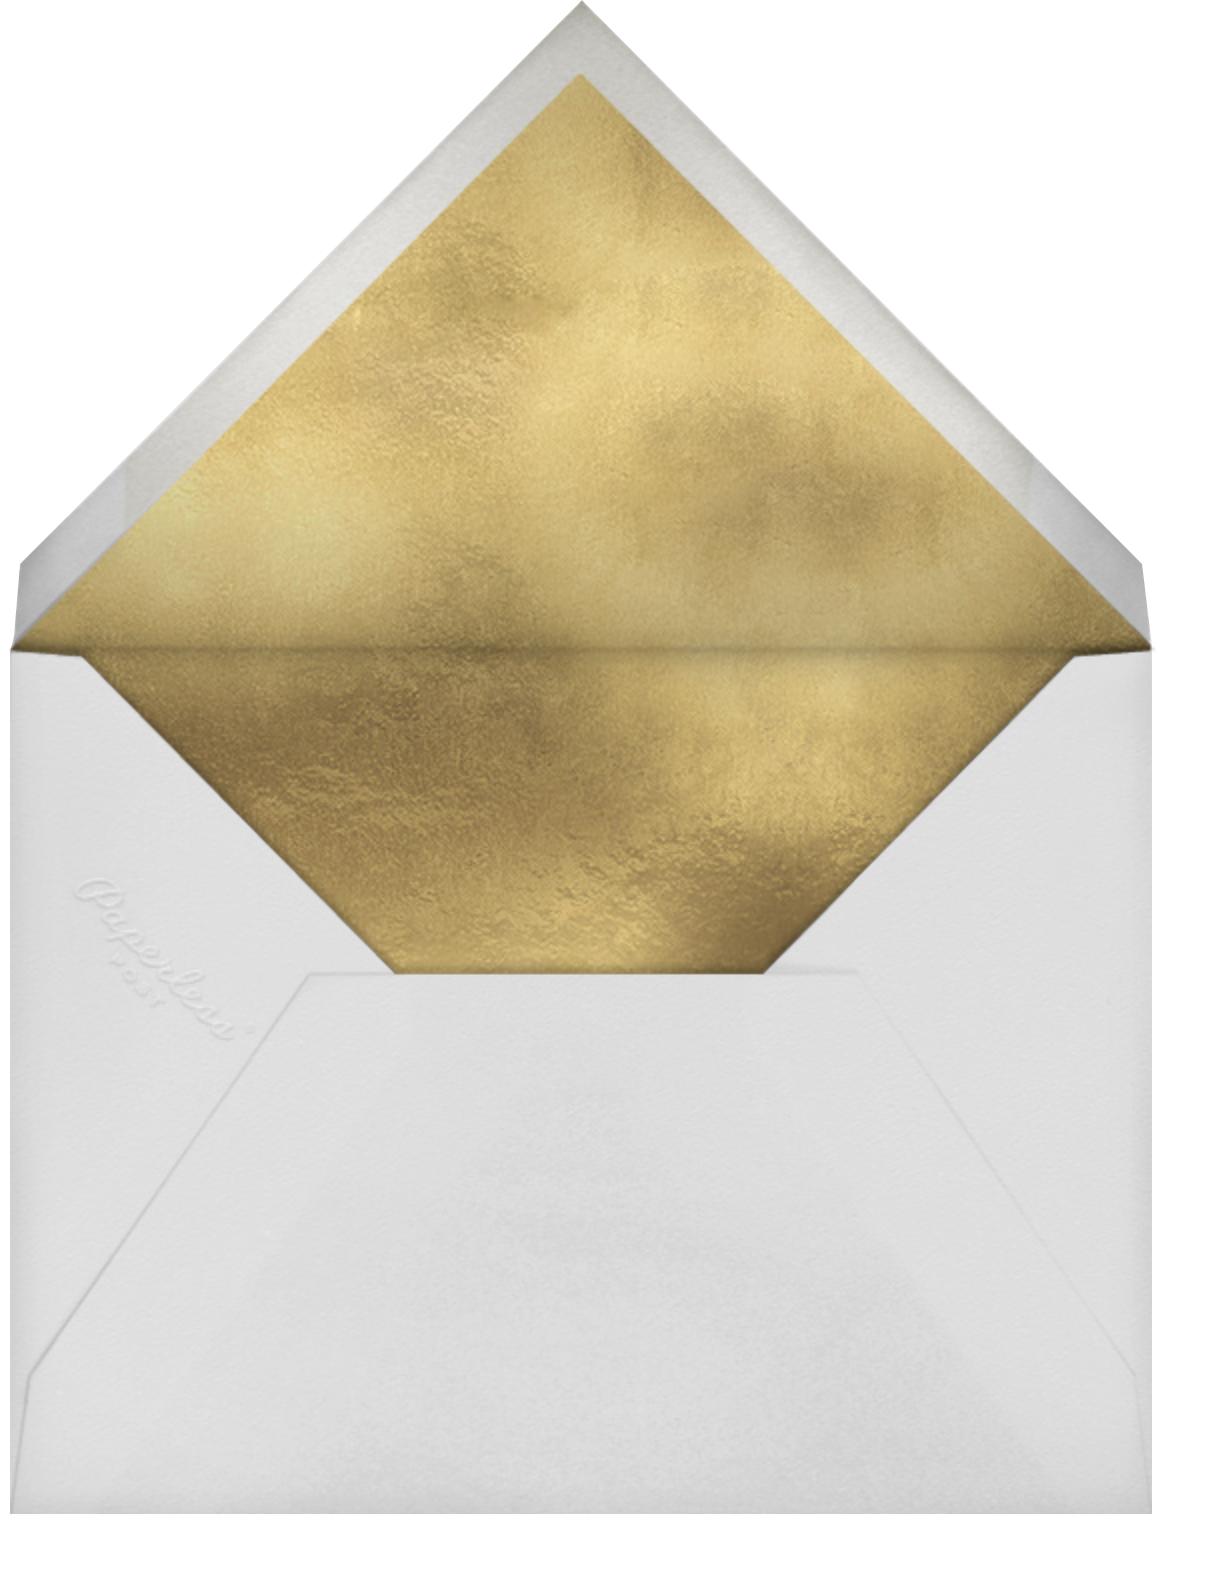 54321 - kate spade new york - New Year - envelope back